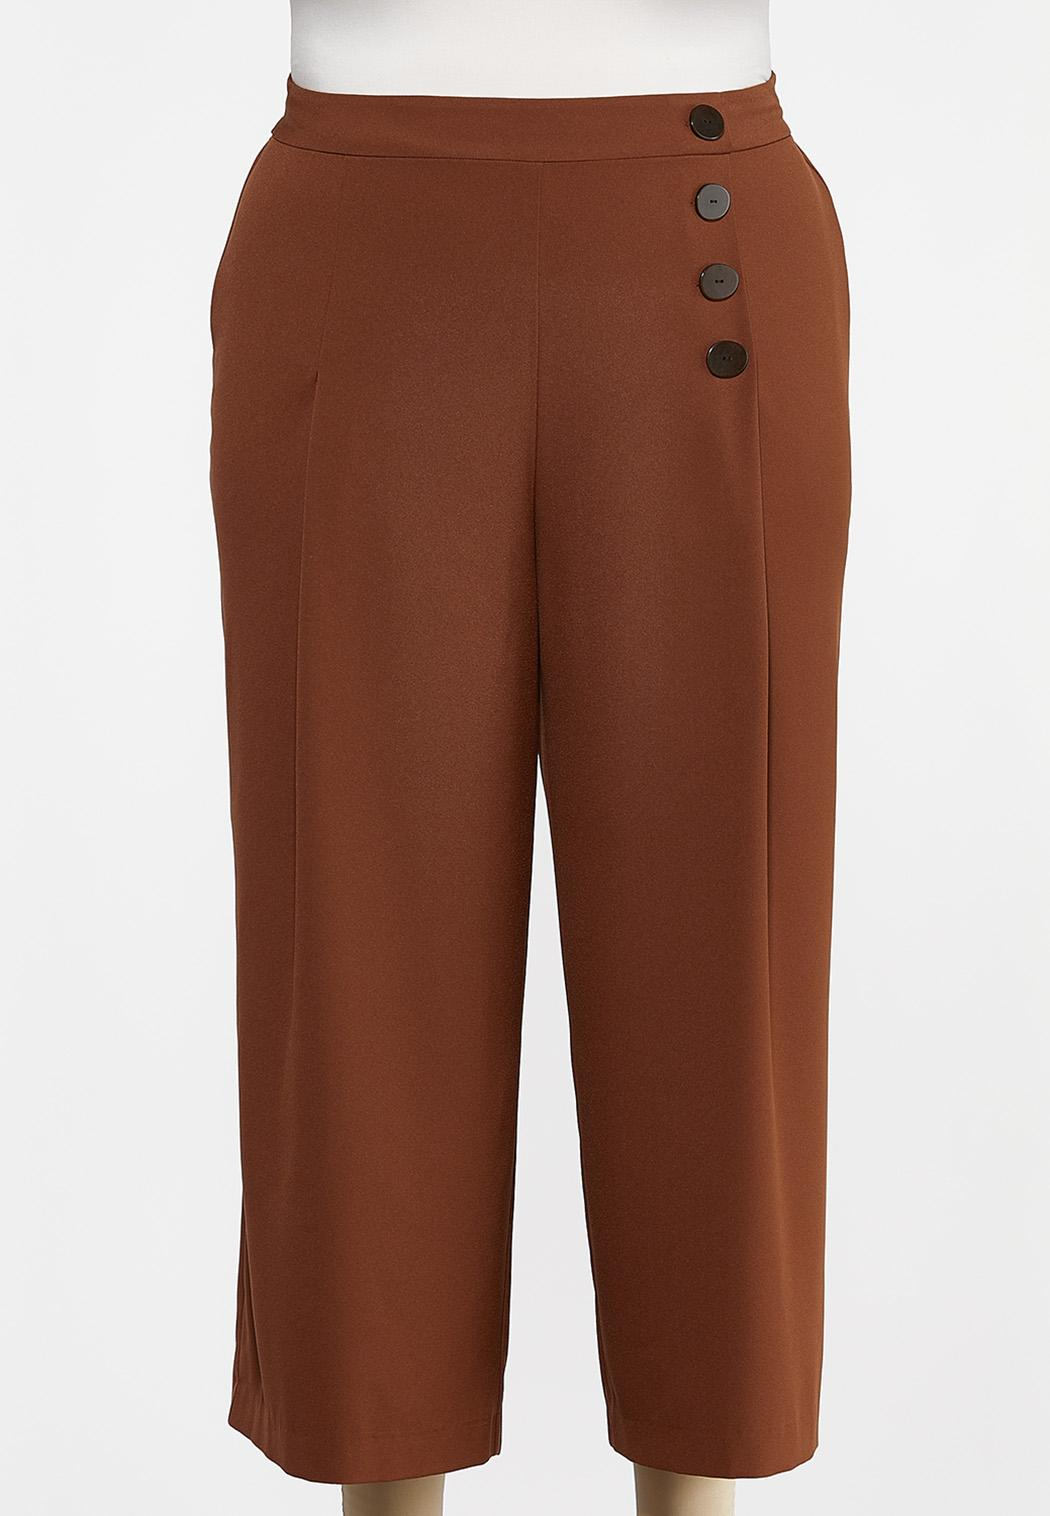 Plus Size Cropped Button Front Pants